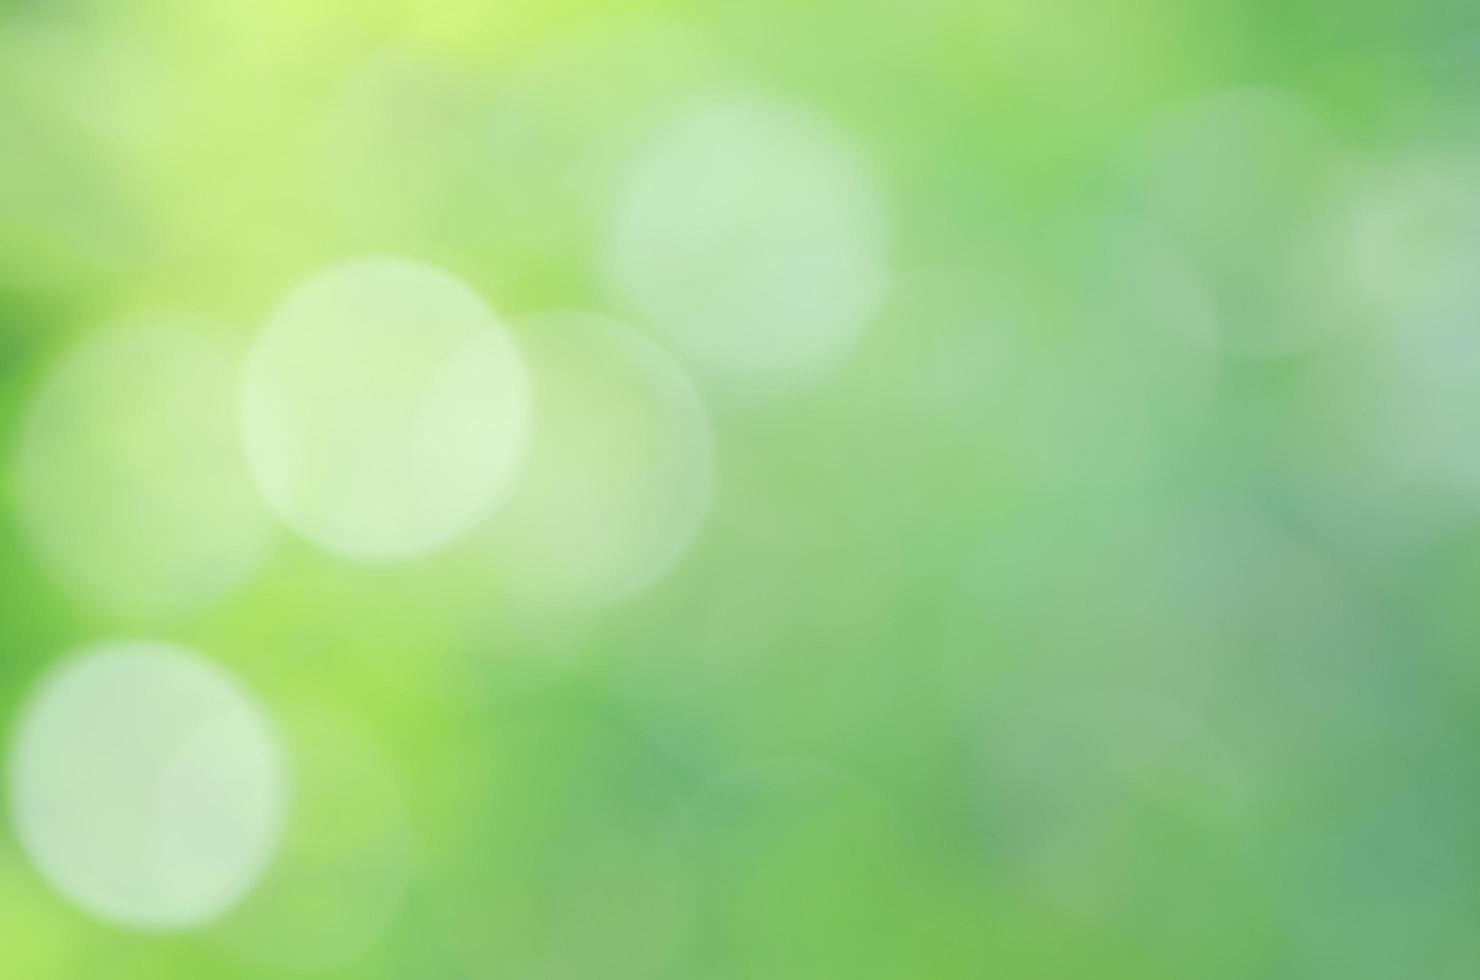 romantc gul vit grön färg bokeh sunlights bakgrunder foto